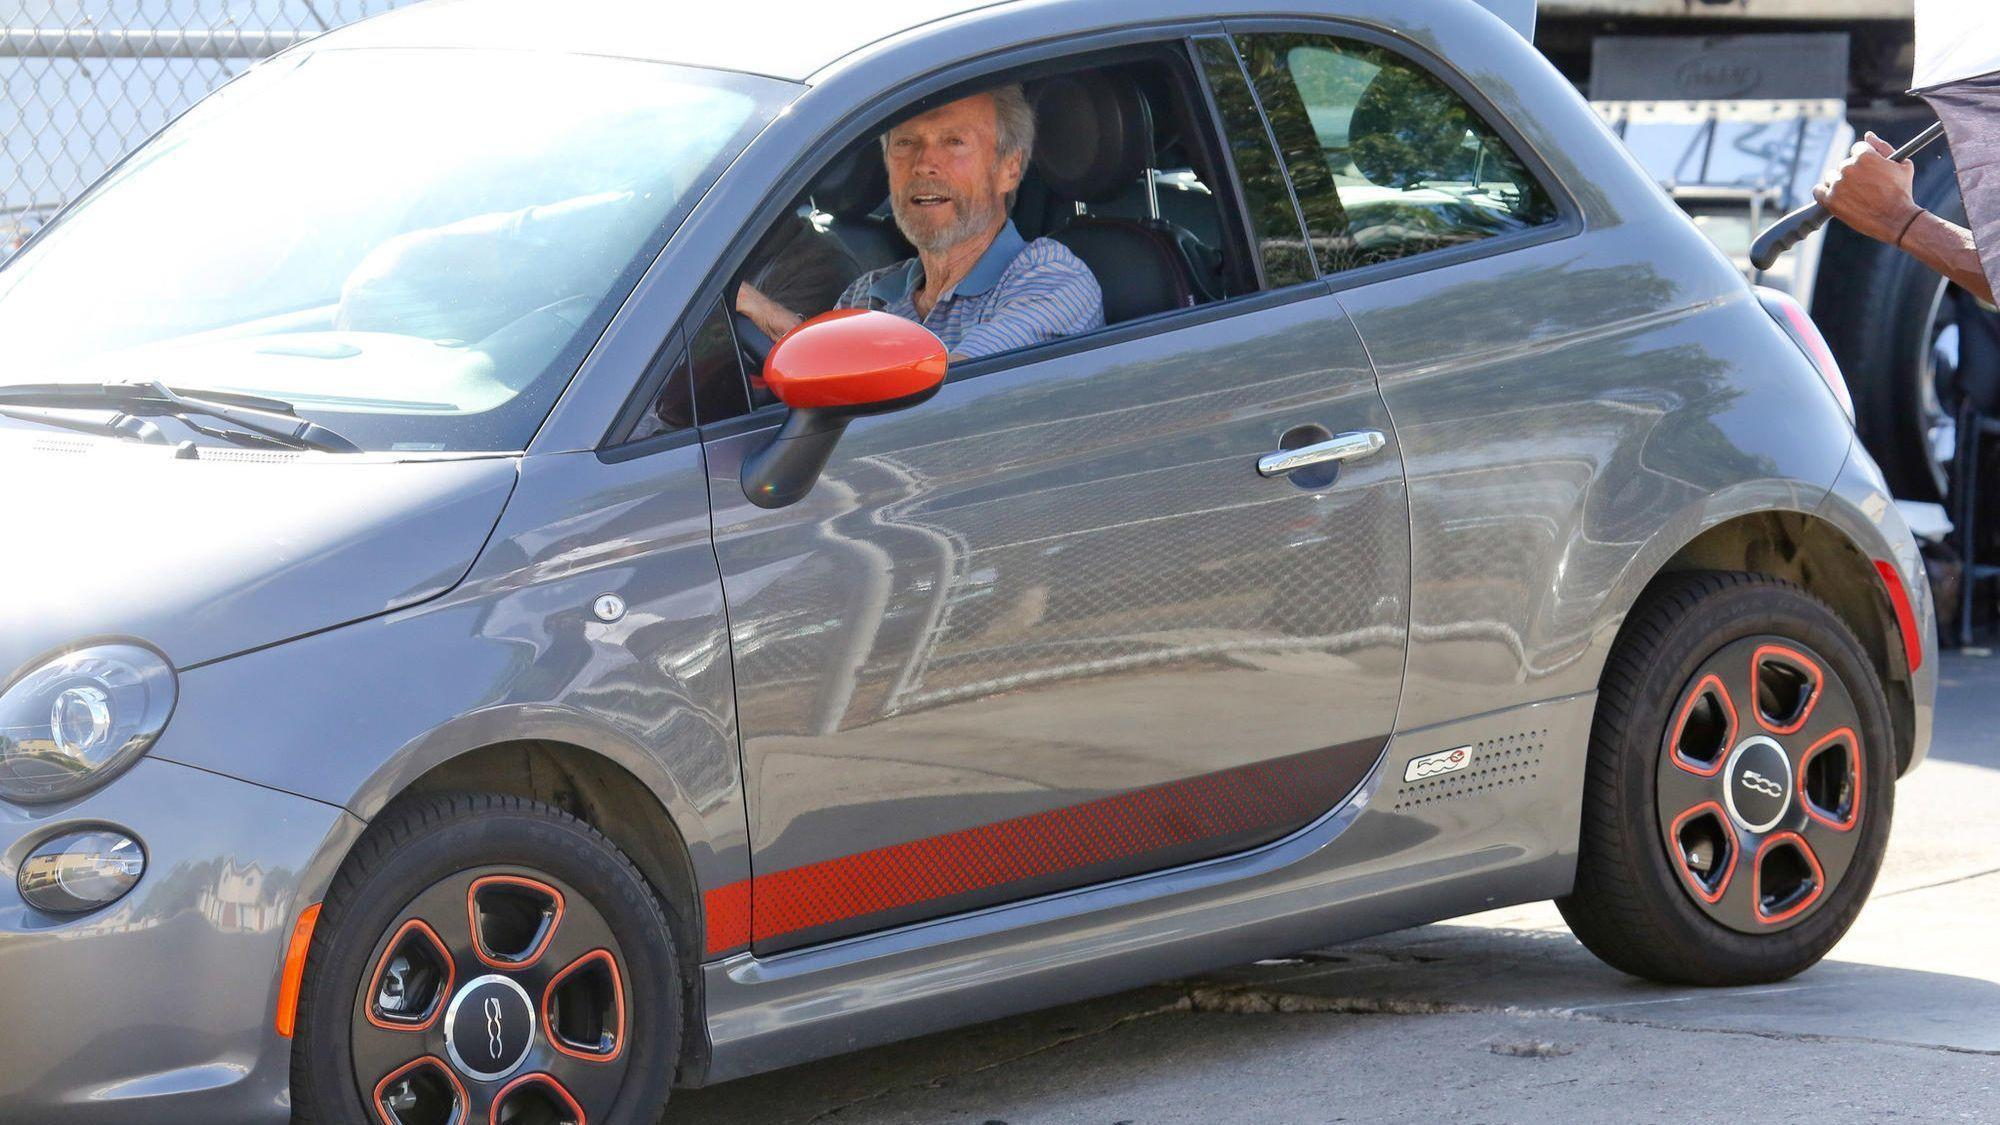 Fiat Fuel Consumption on fiat ducato, fiat linea, fiat doblo, fiat models, fiat cinquecento, fiat 500c, fiat 126p, fiat seicento, fiat 500e, fiat convertible, fiat hatchback, fiat palio, fiat croma,